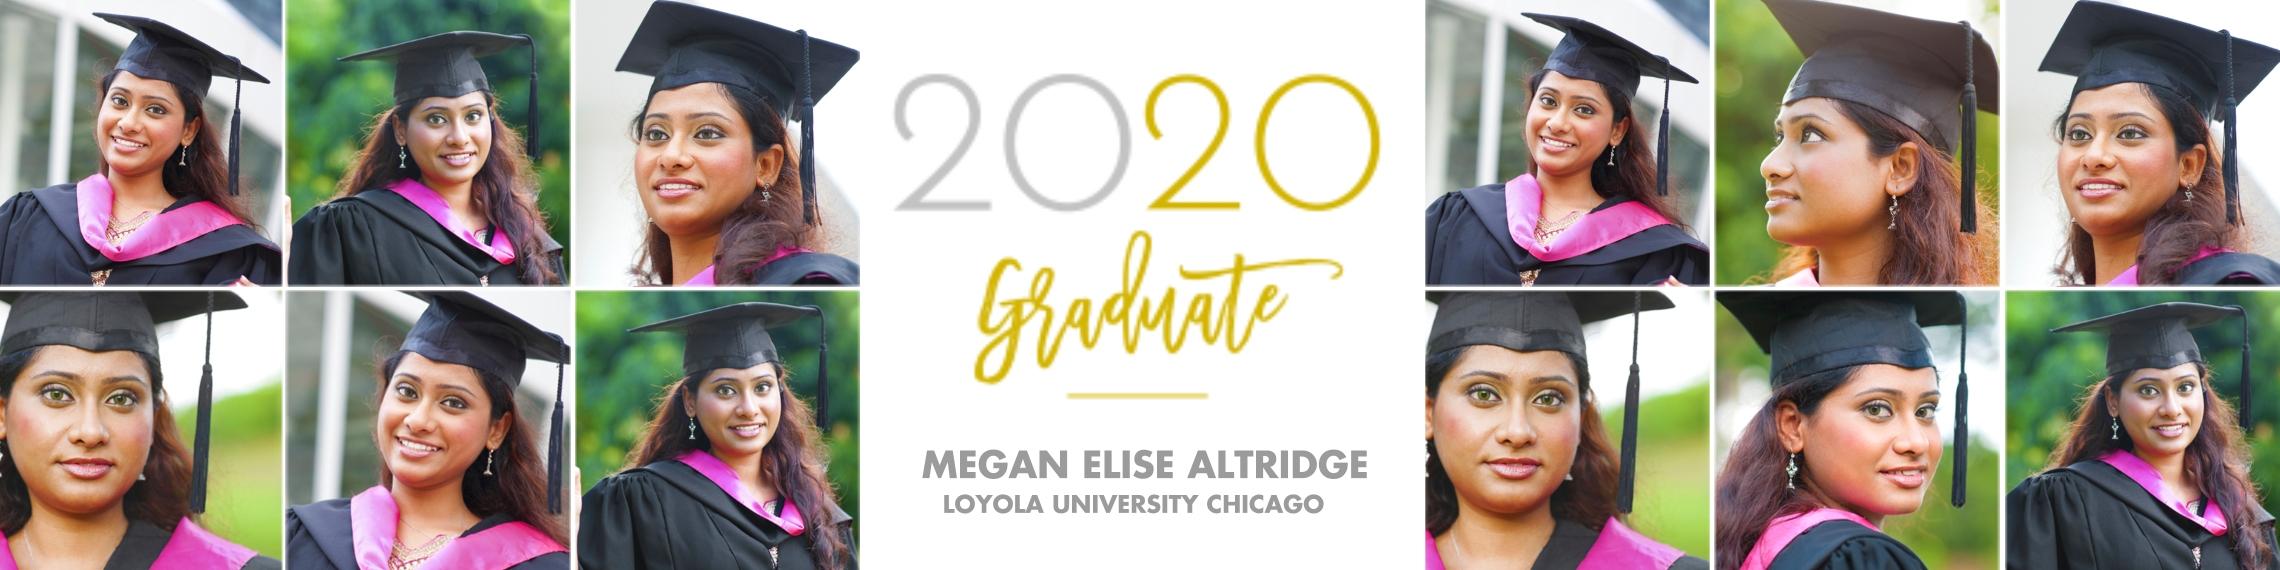 Graduation Photo Banner 2x8, Home Décor -Modern Classic Graduate